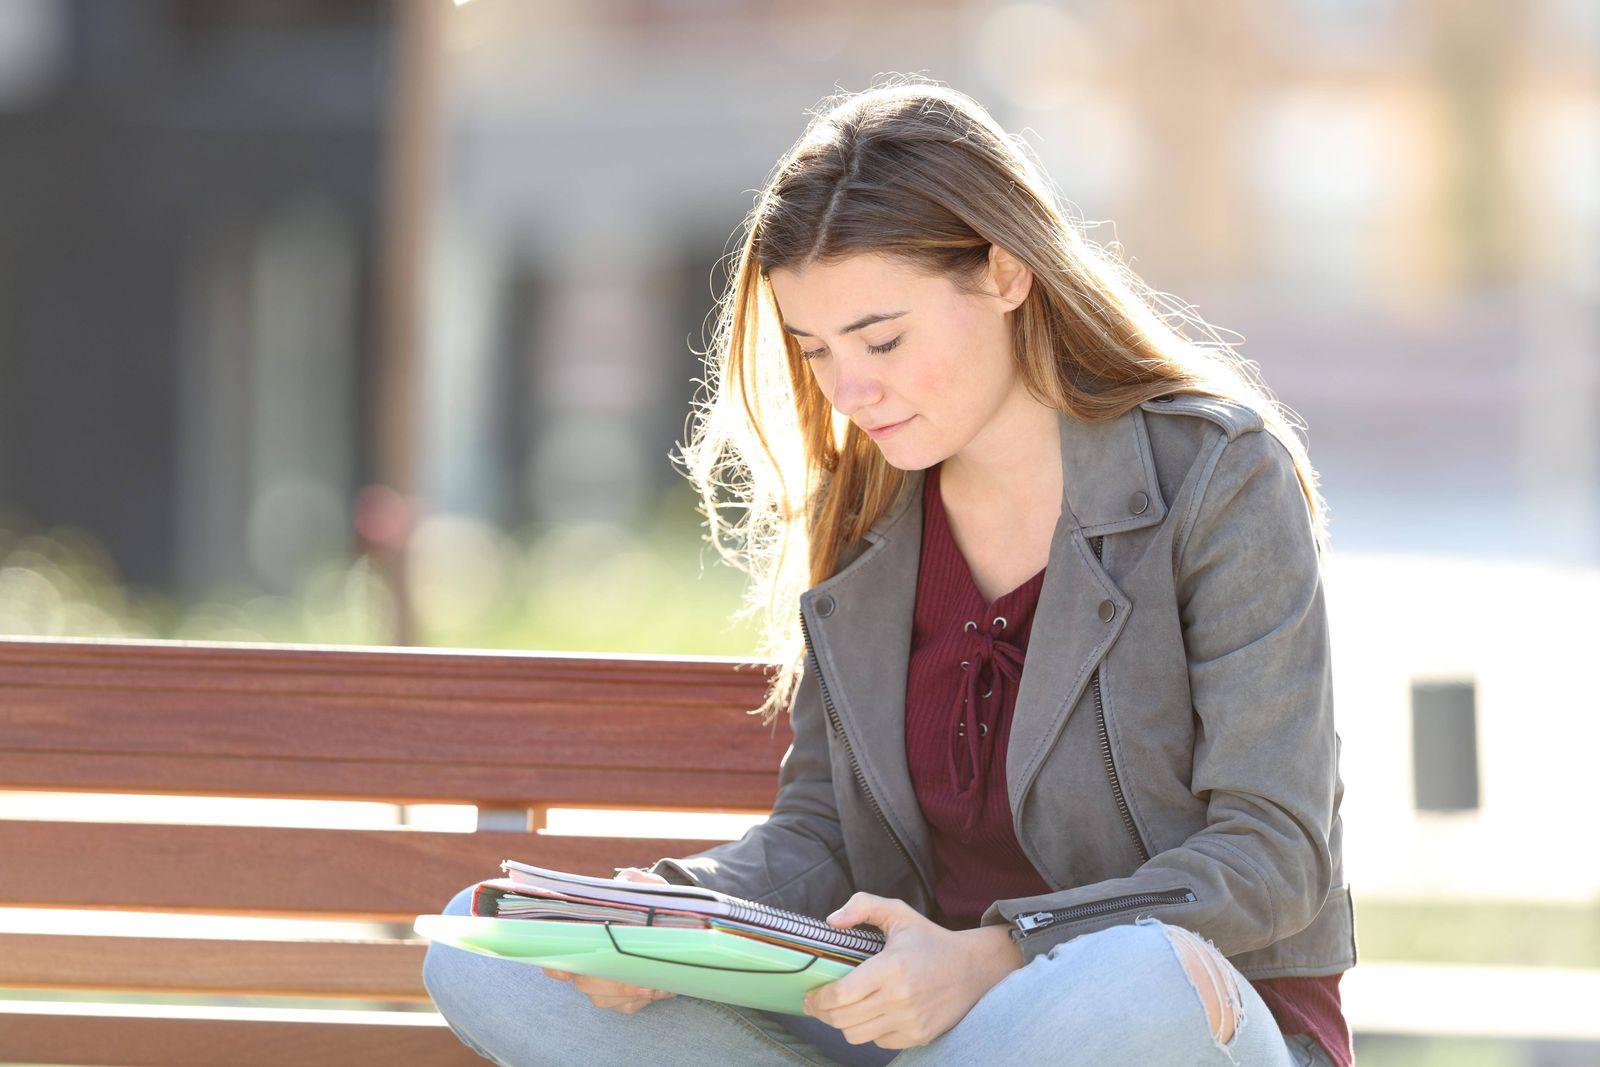 Student learning reading notes on a bench model released Symbolfoto PUBLICATIONxINxGERxSUIxAUTxON